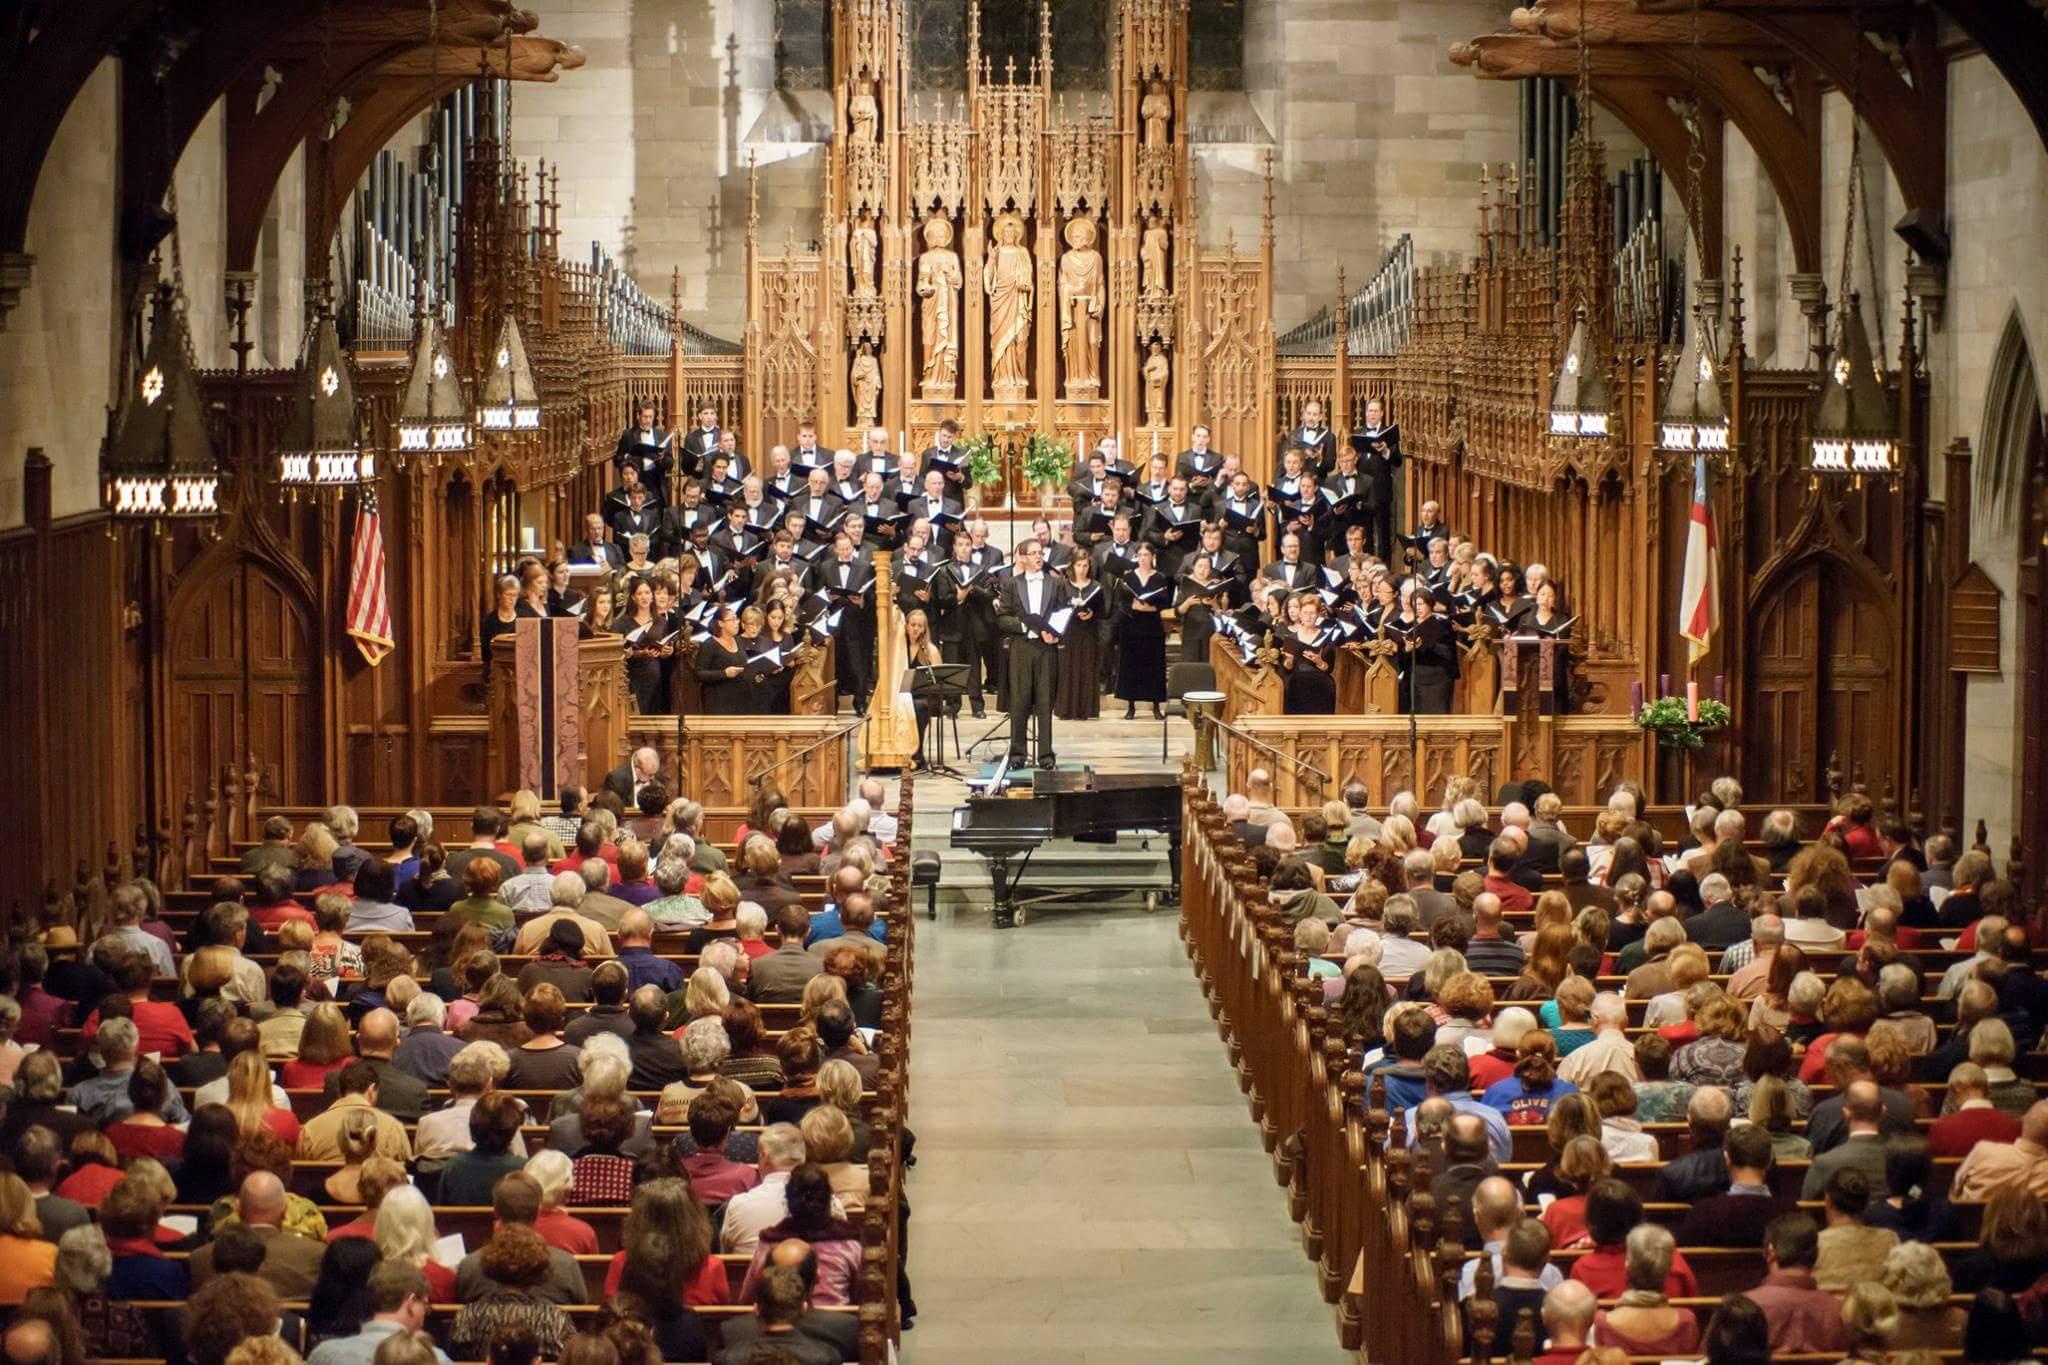 A Feast of Carols with the transcendent Mendelssohn Club